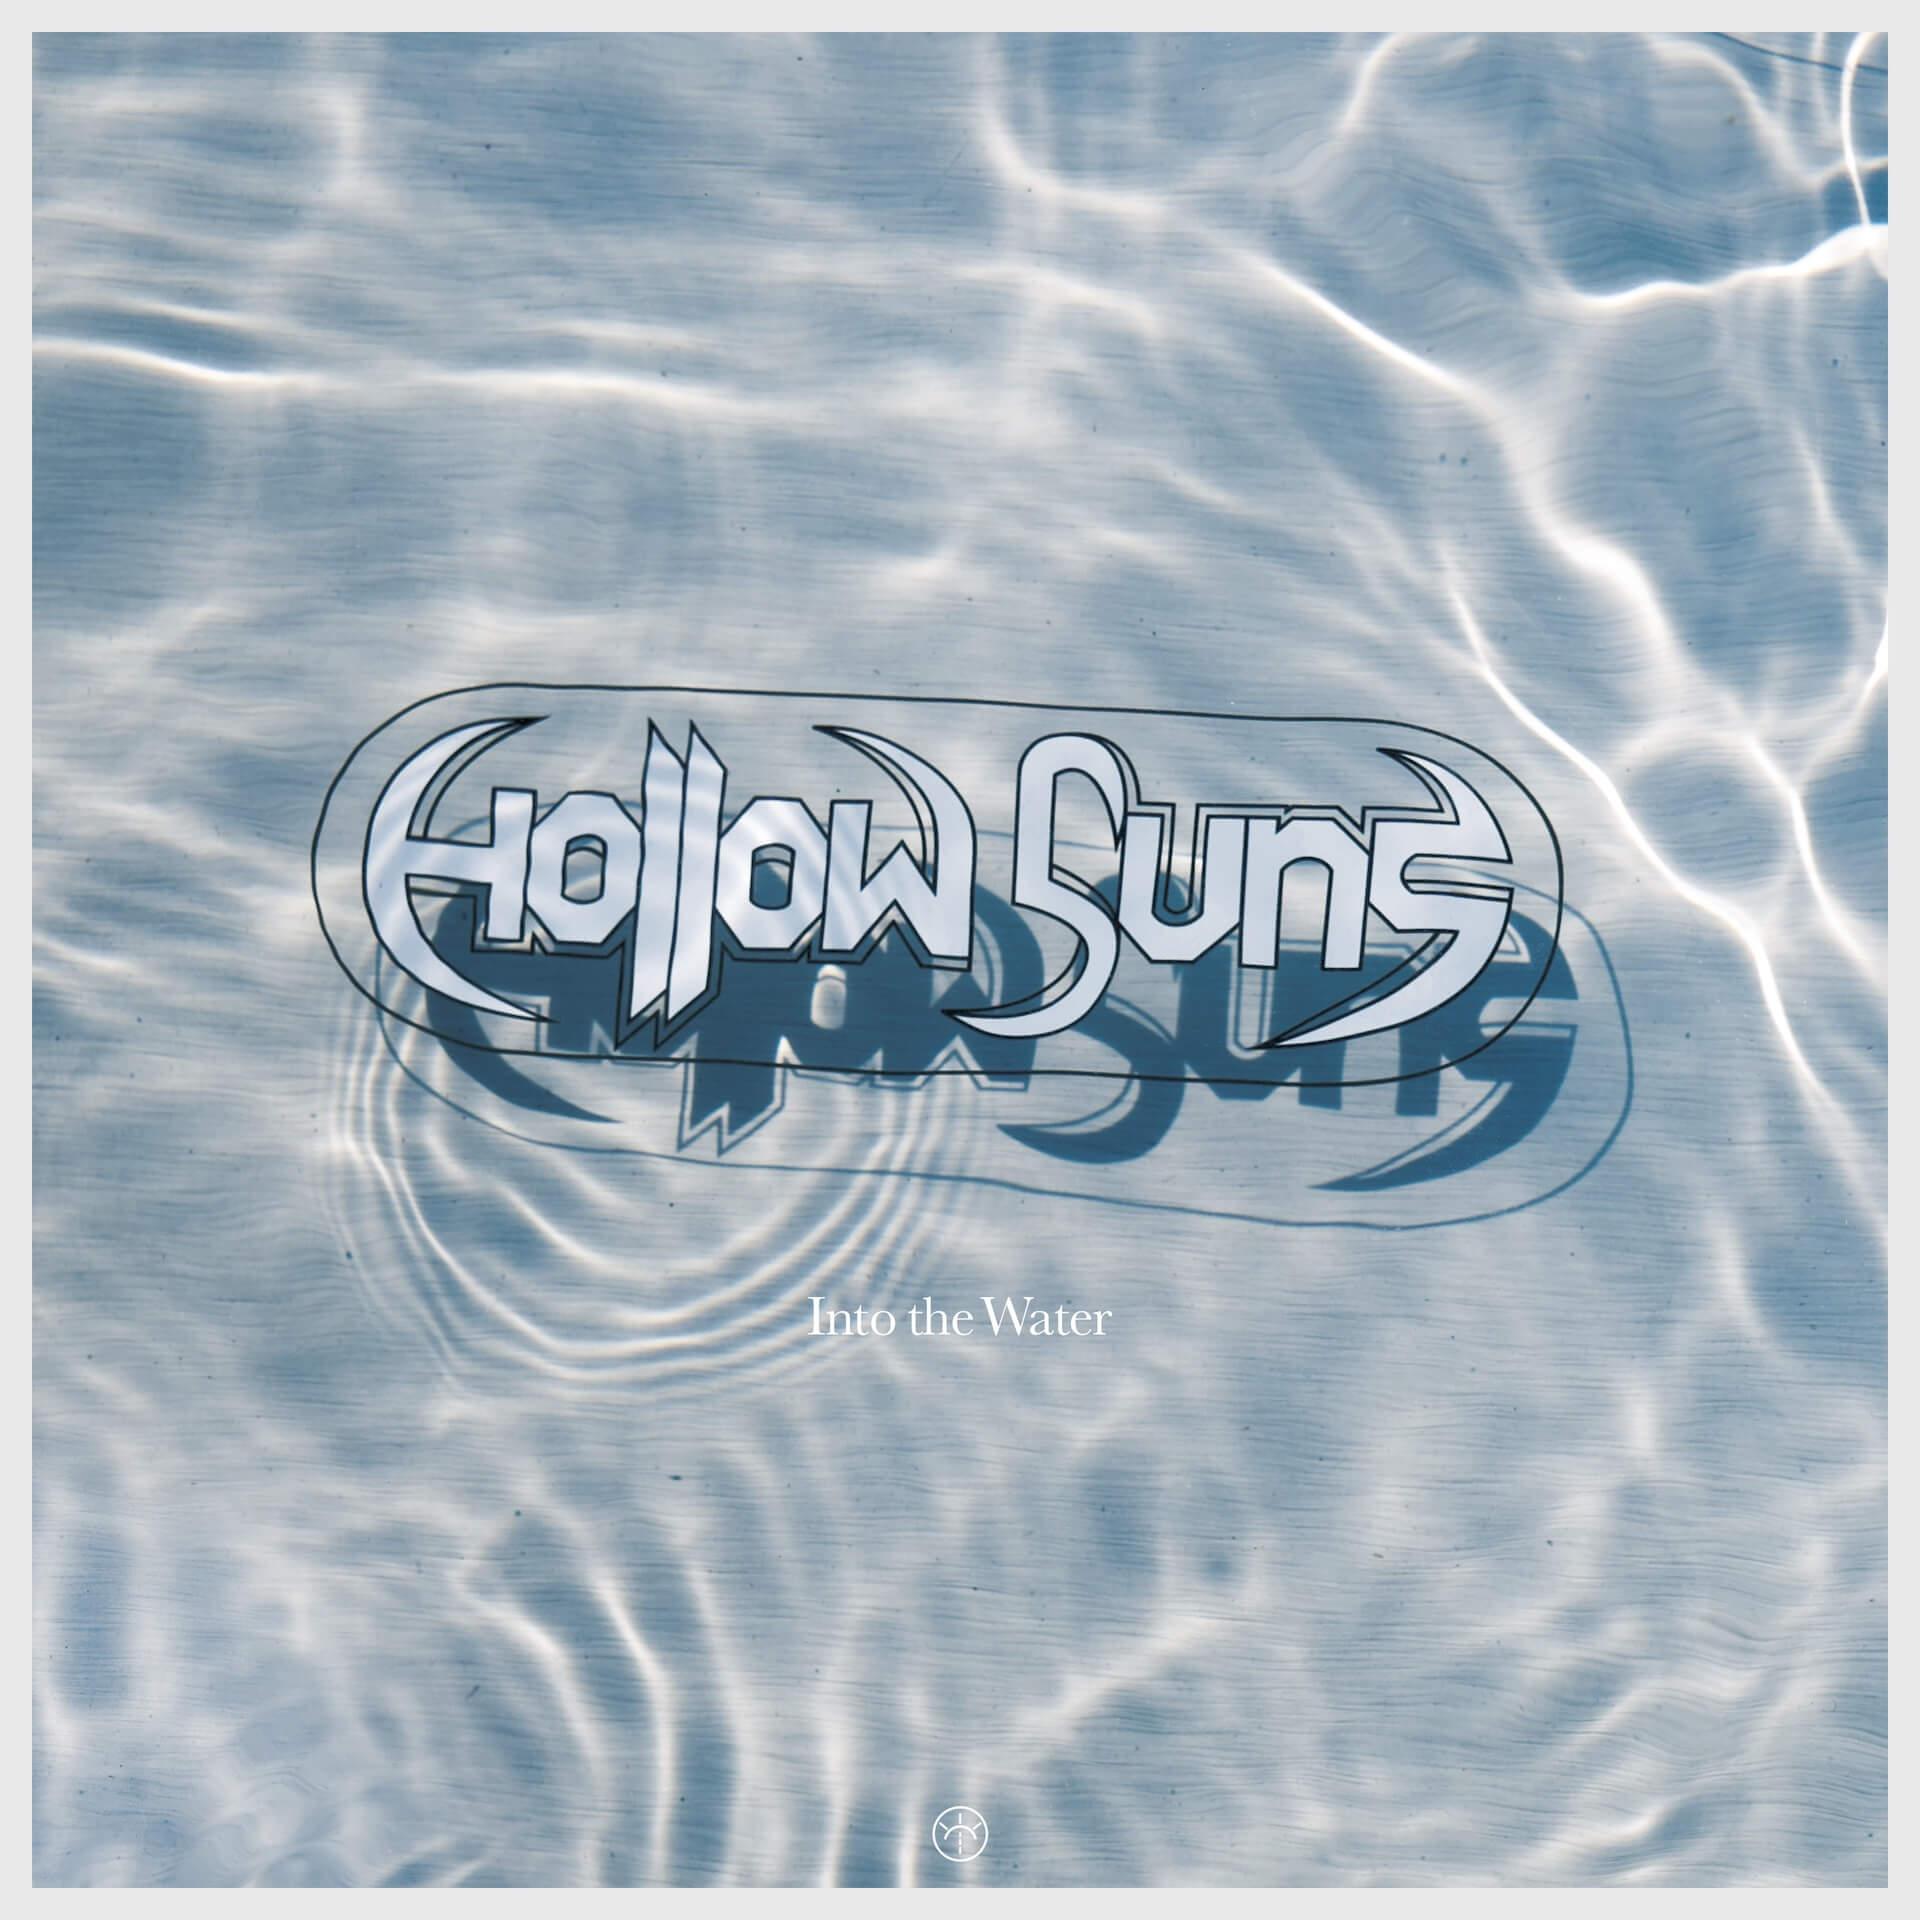 "COUNTRY YARDやSHADOWSとの共演で話題のバンドHollow Sunsが新曲""Into the Water""をリリース! music190911_horrowsuns_01"